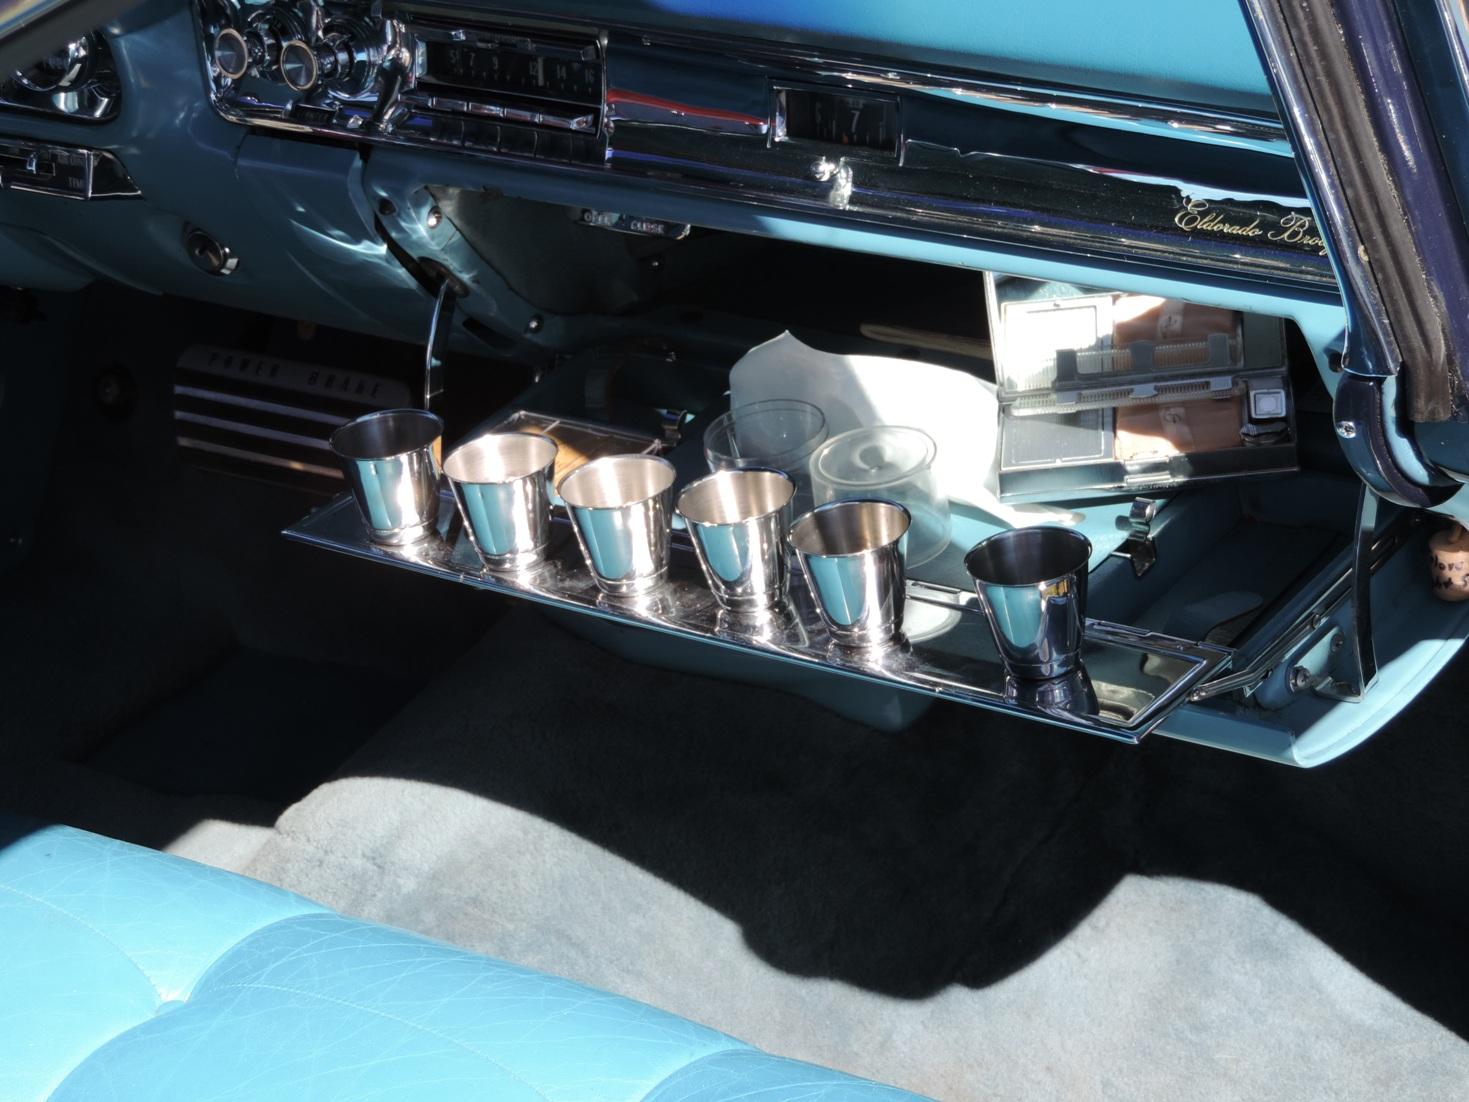 1957 Cadillac Eldorado Brougham tumblers in glove box